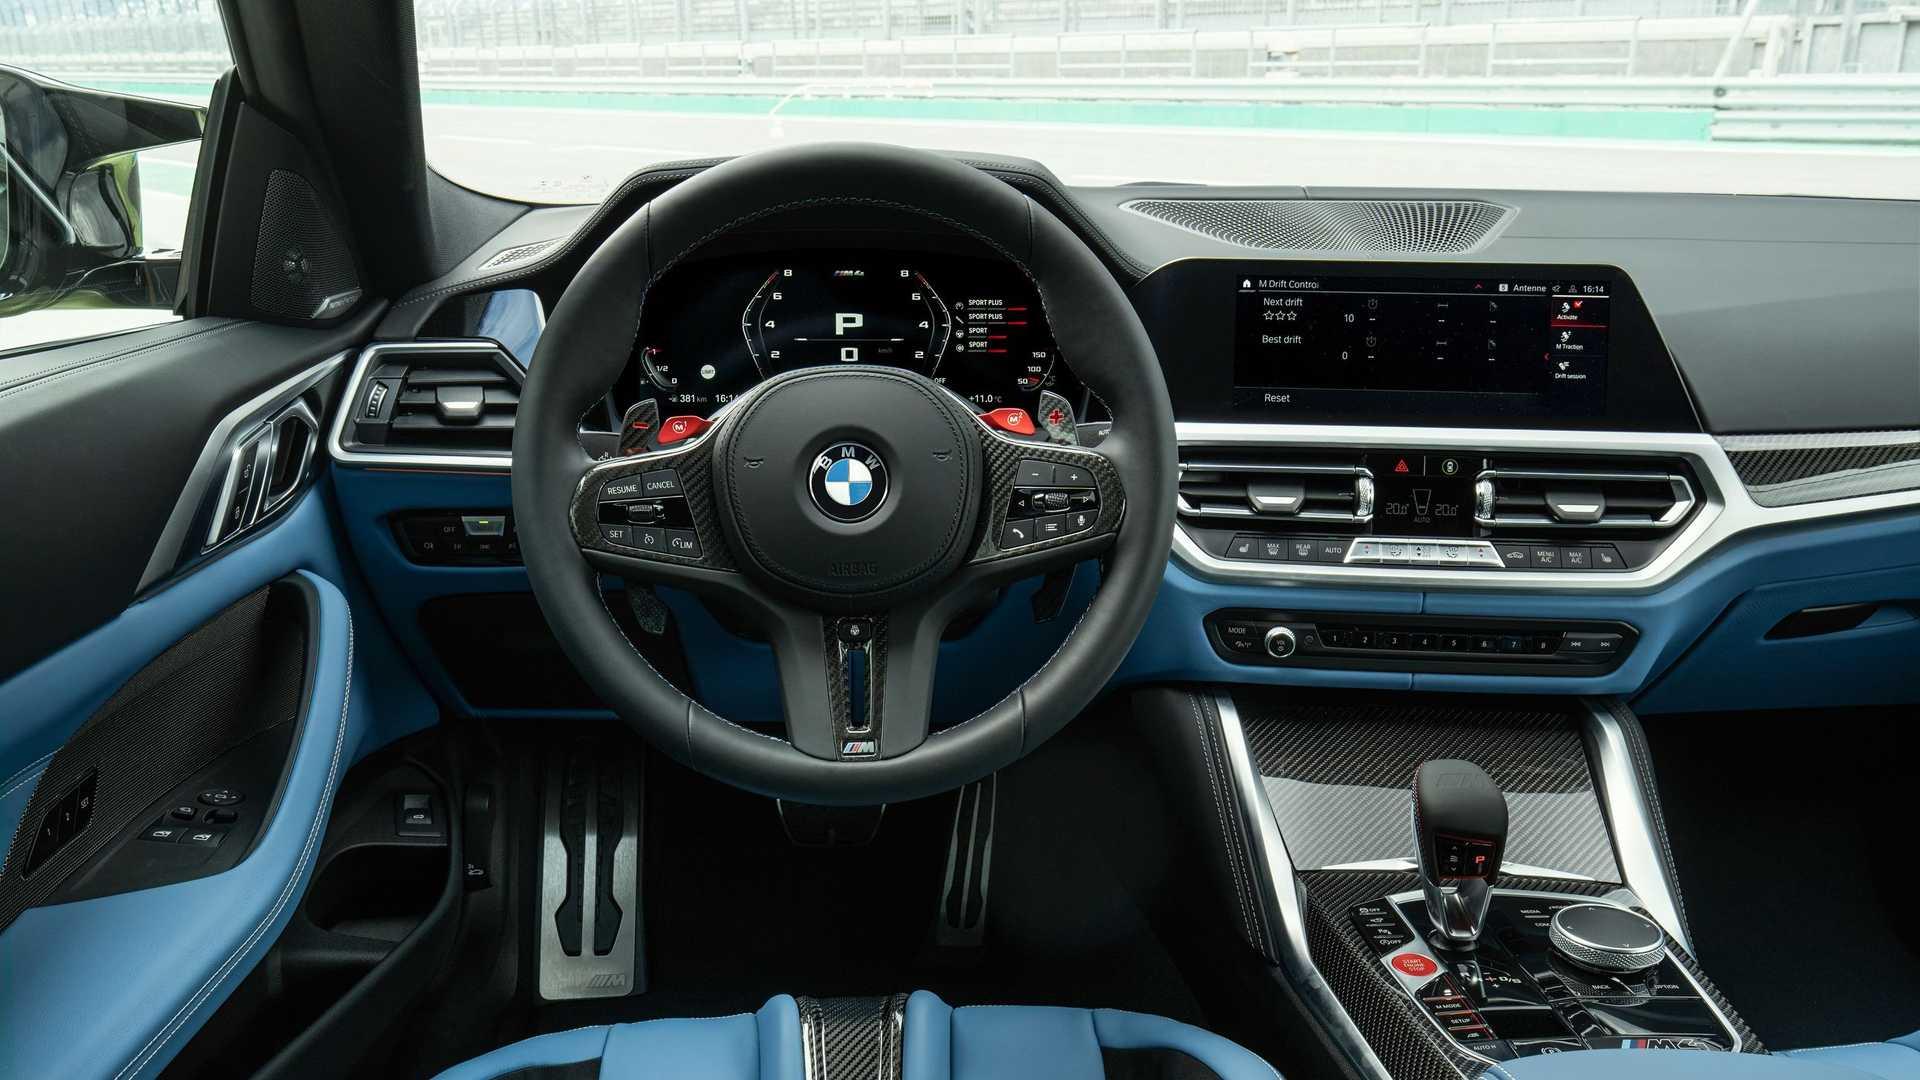 2021-bmw-m4-interior